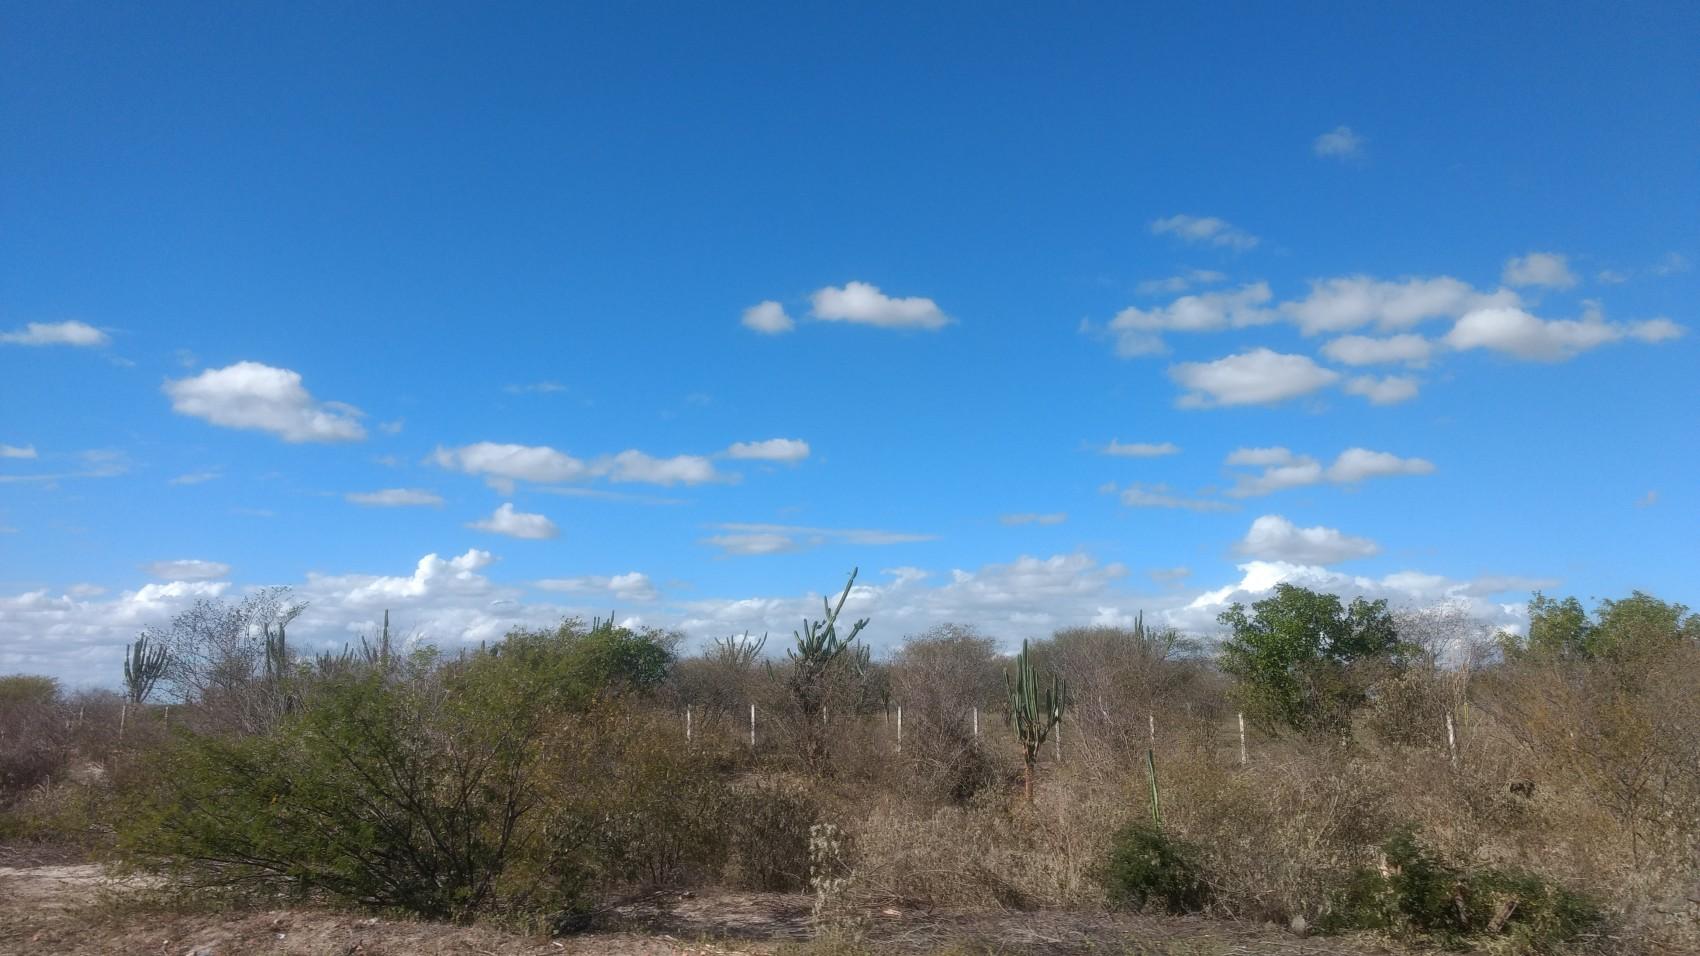 Caatinga arbustivo-arbórea próximo a Itaberaba (BA).